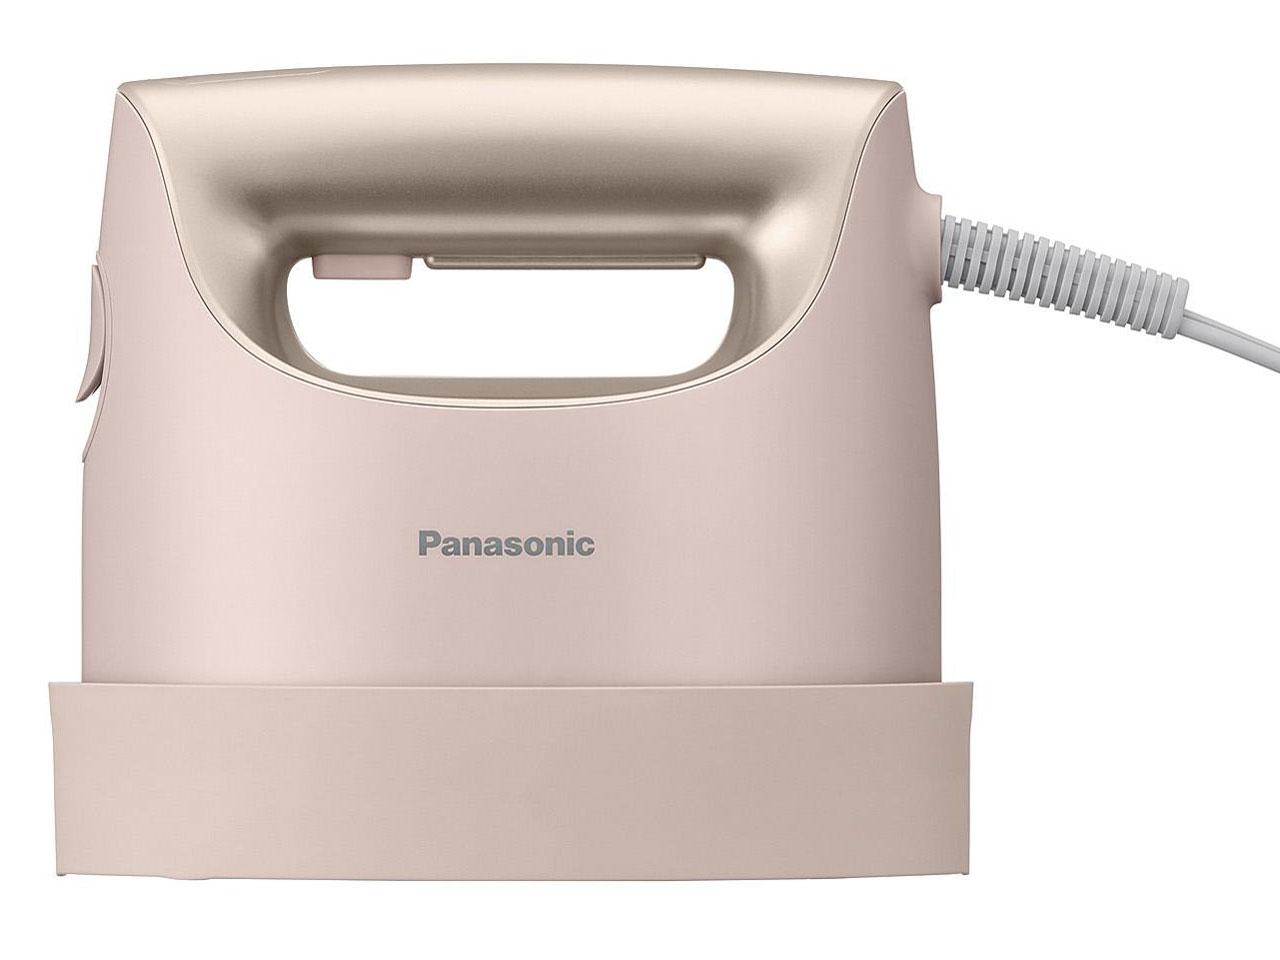 NI-FS750-PN [ピンクゴールド] の製品画像